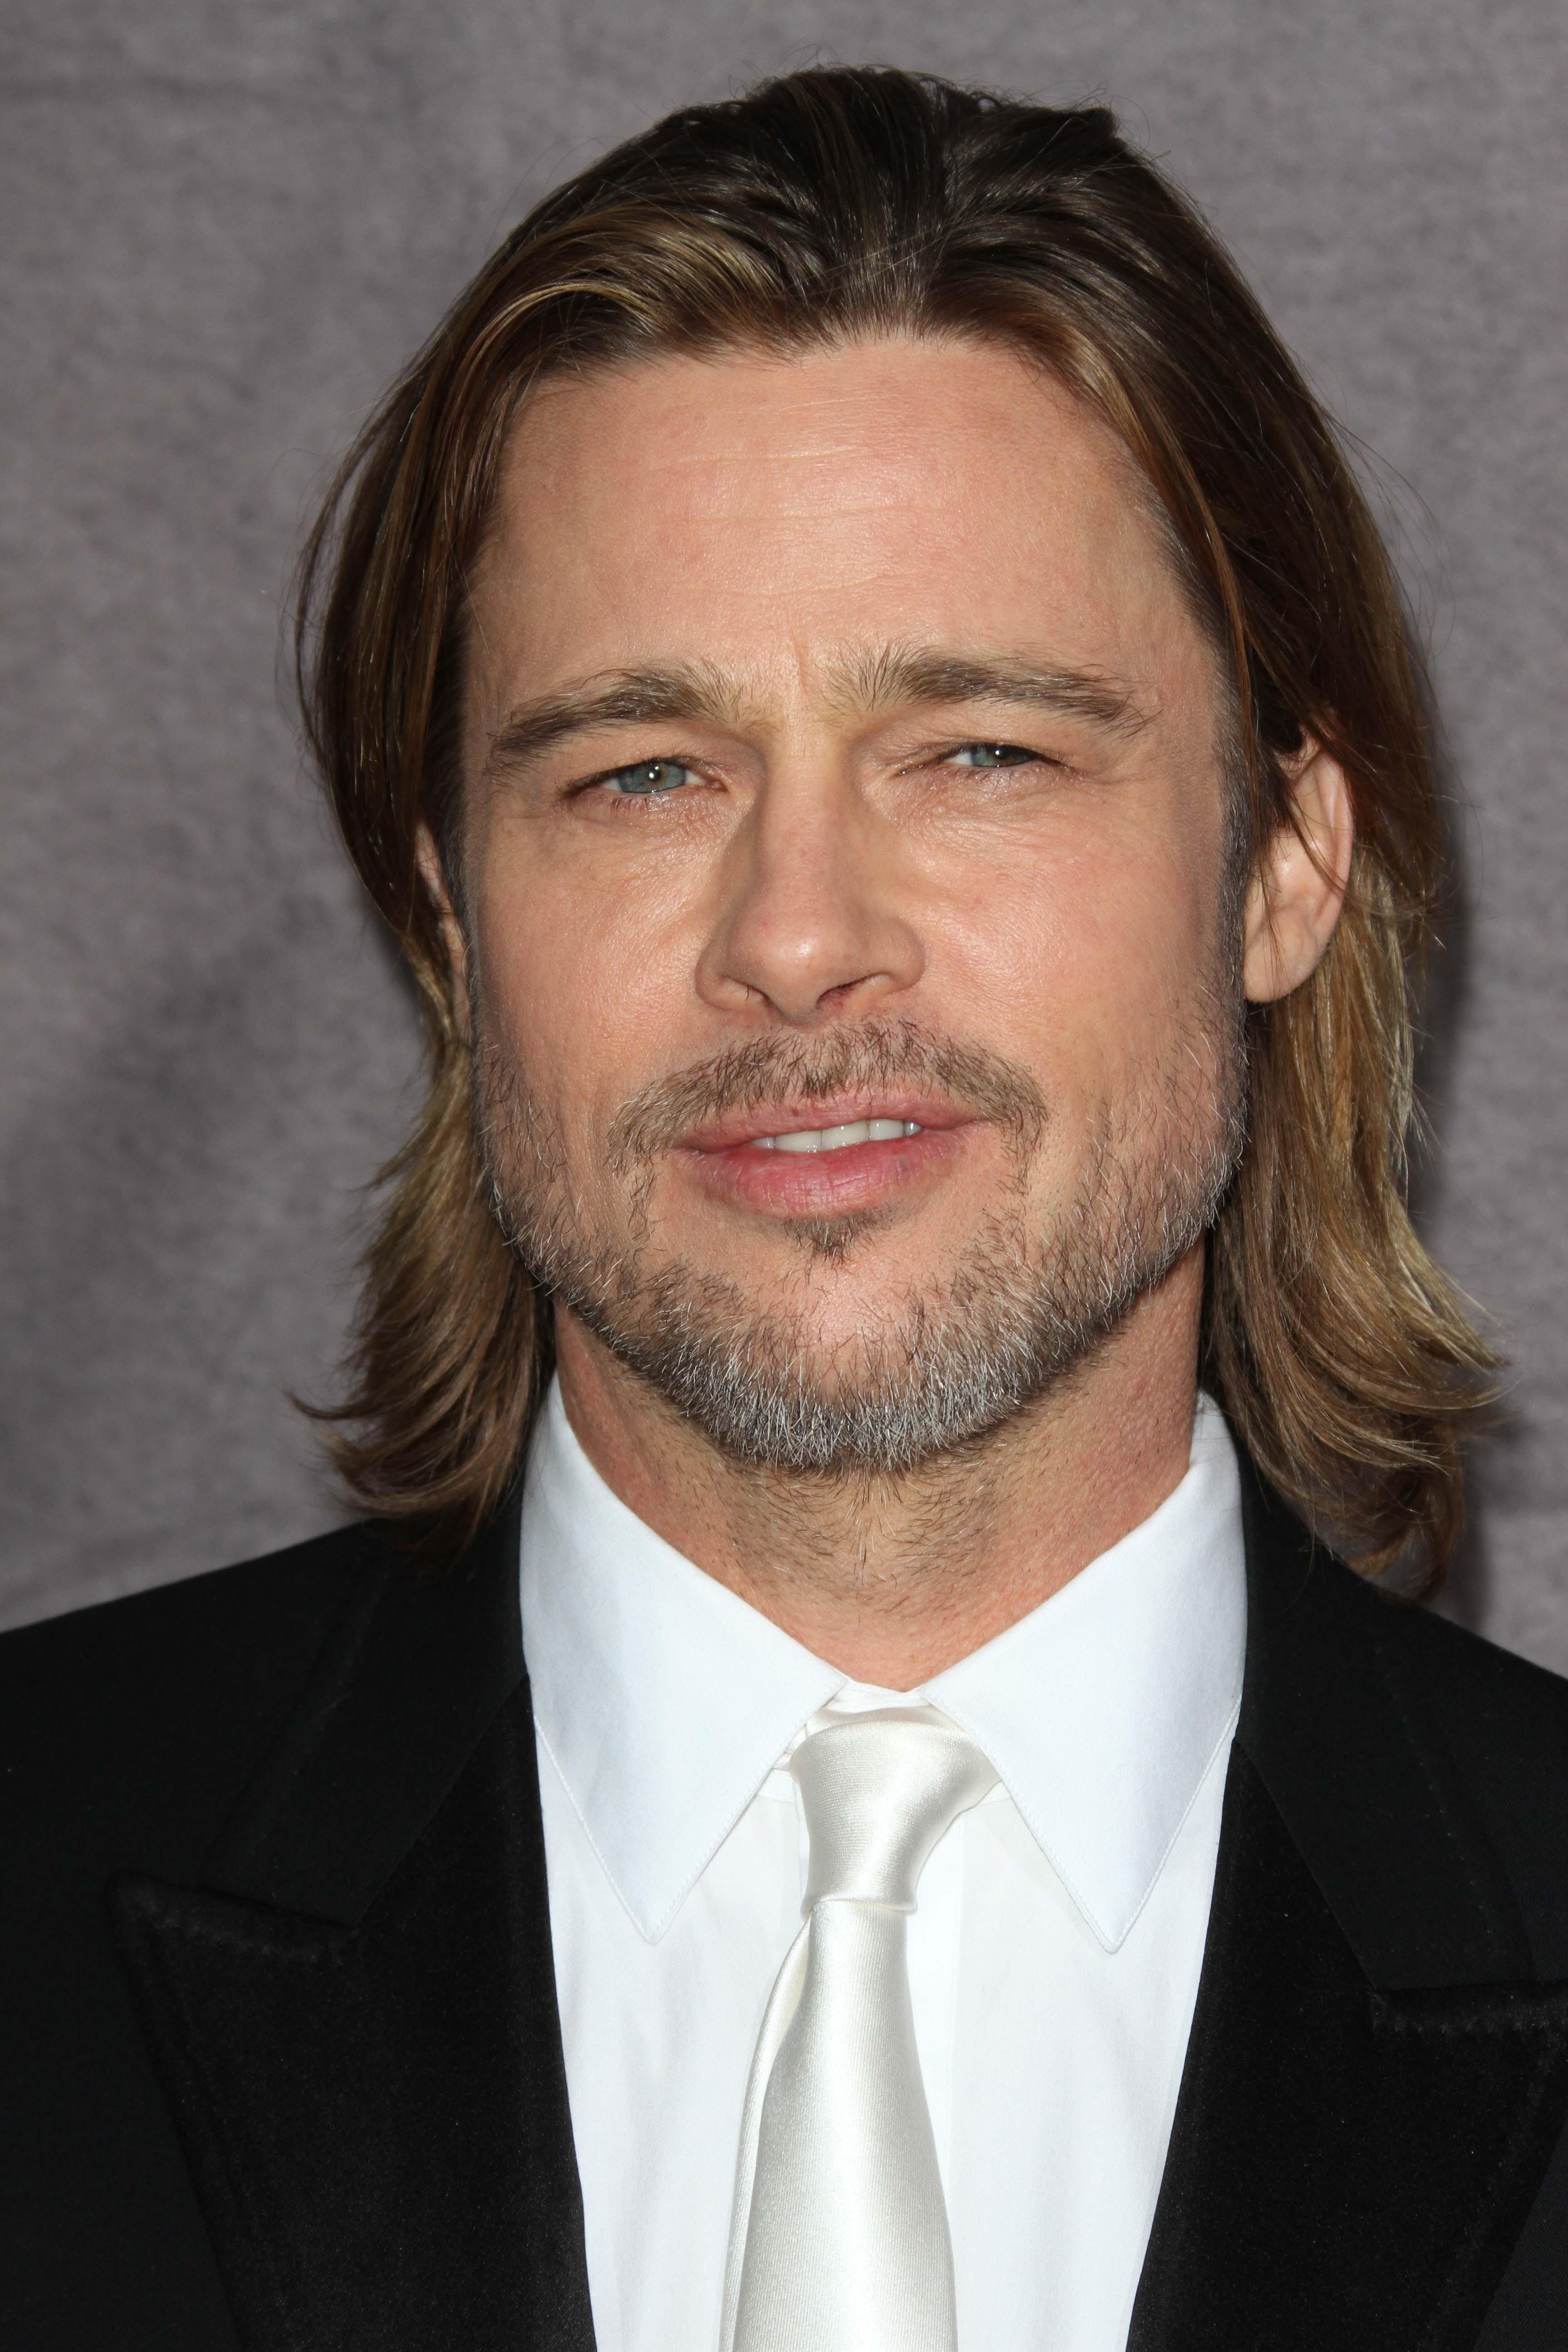 The Celebrity Mustache : From Brad Pitt to Zac Efron